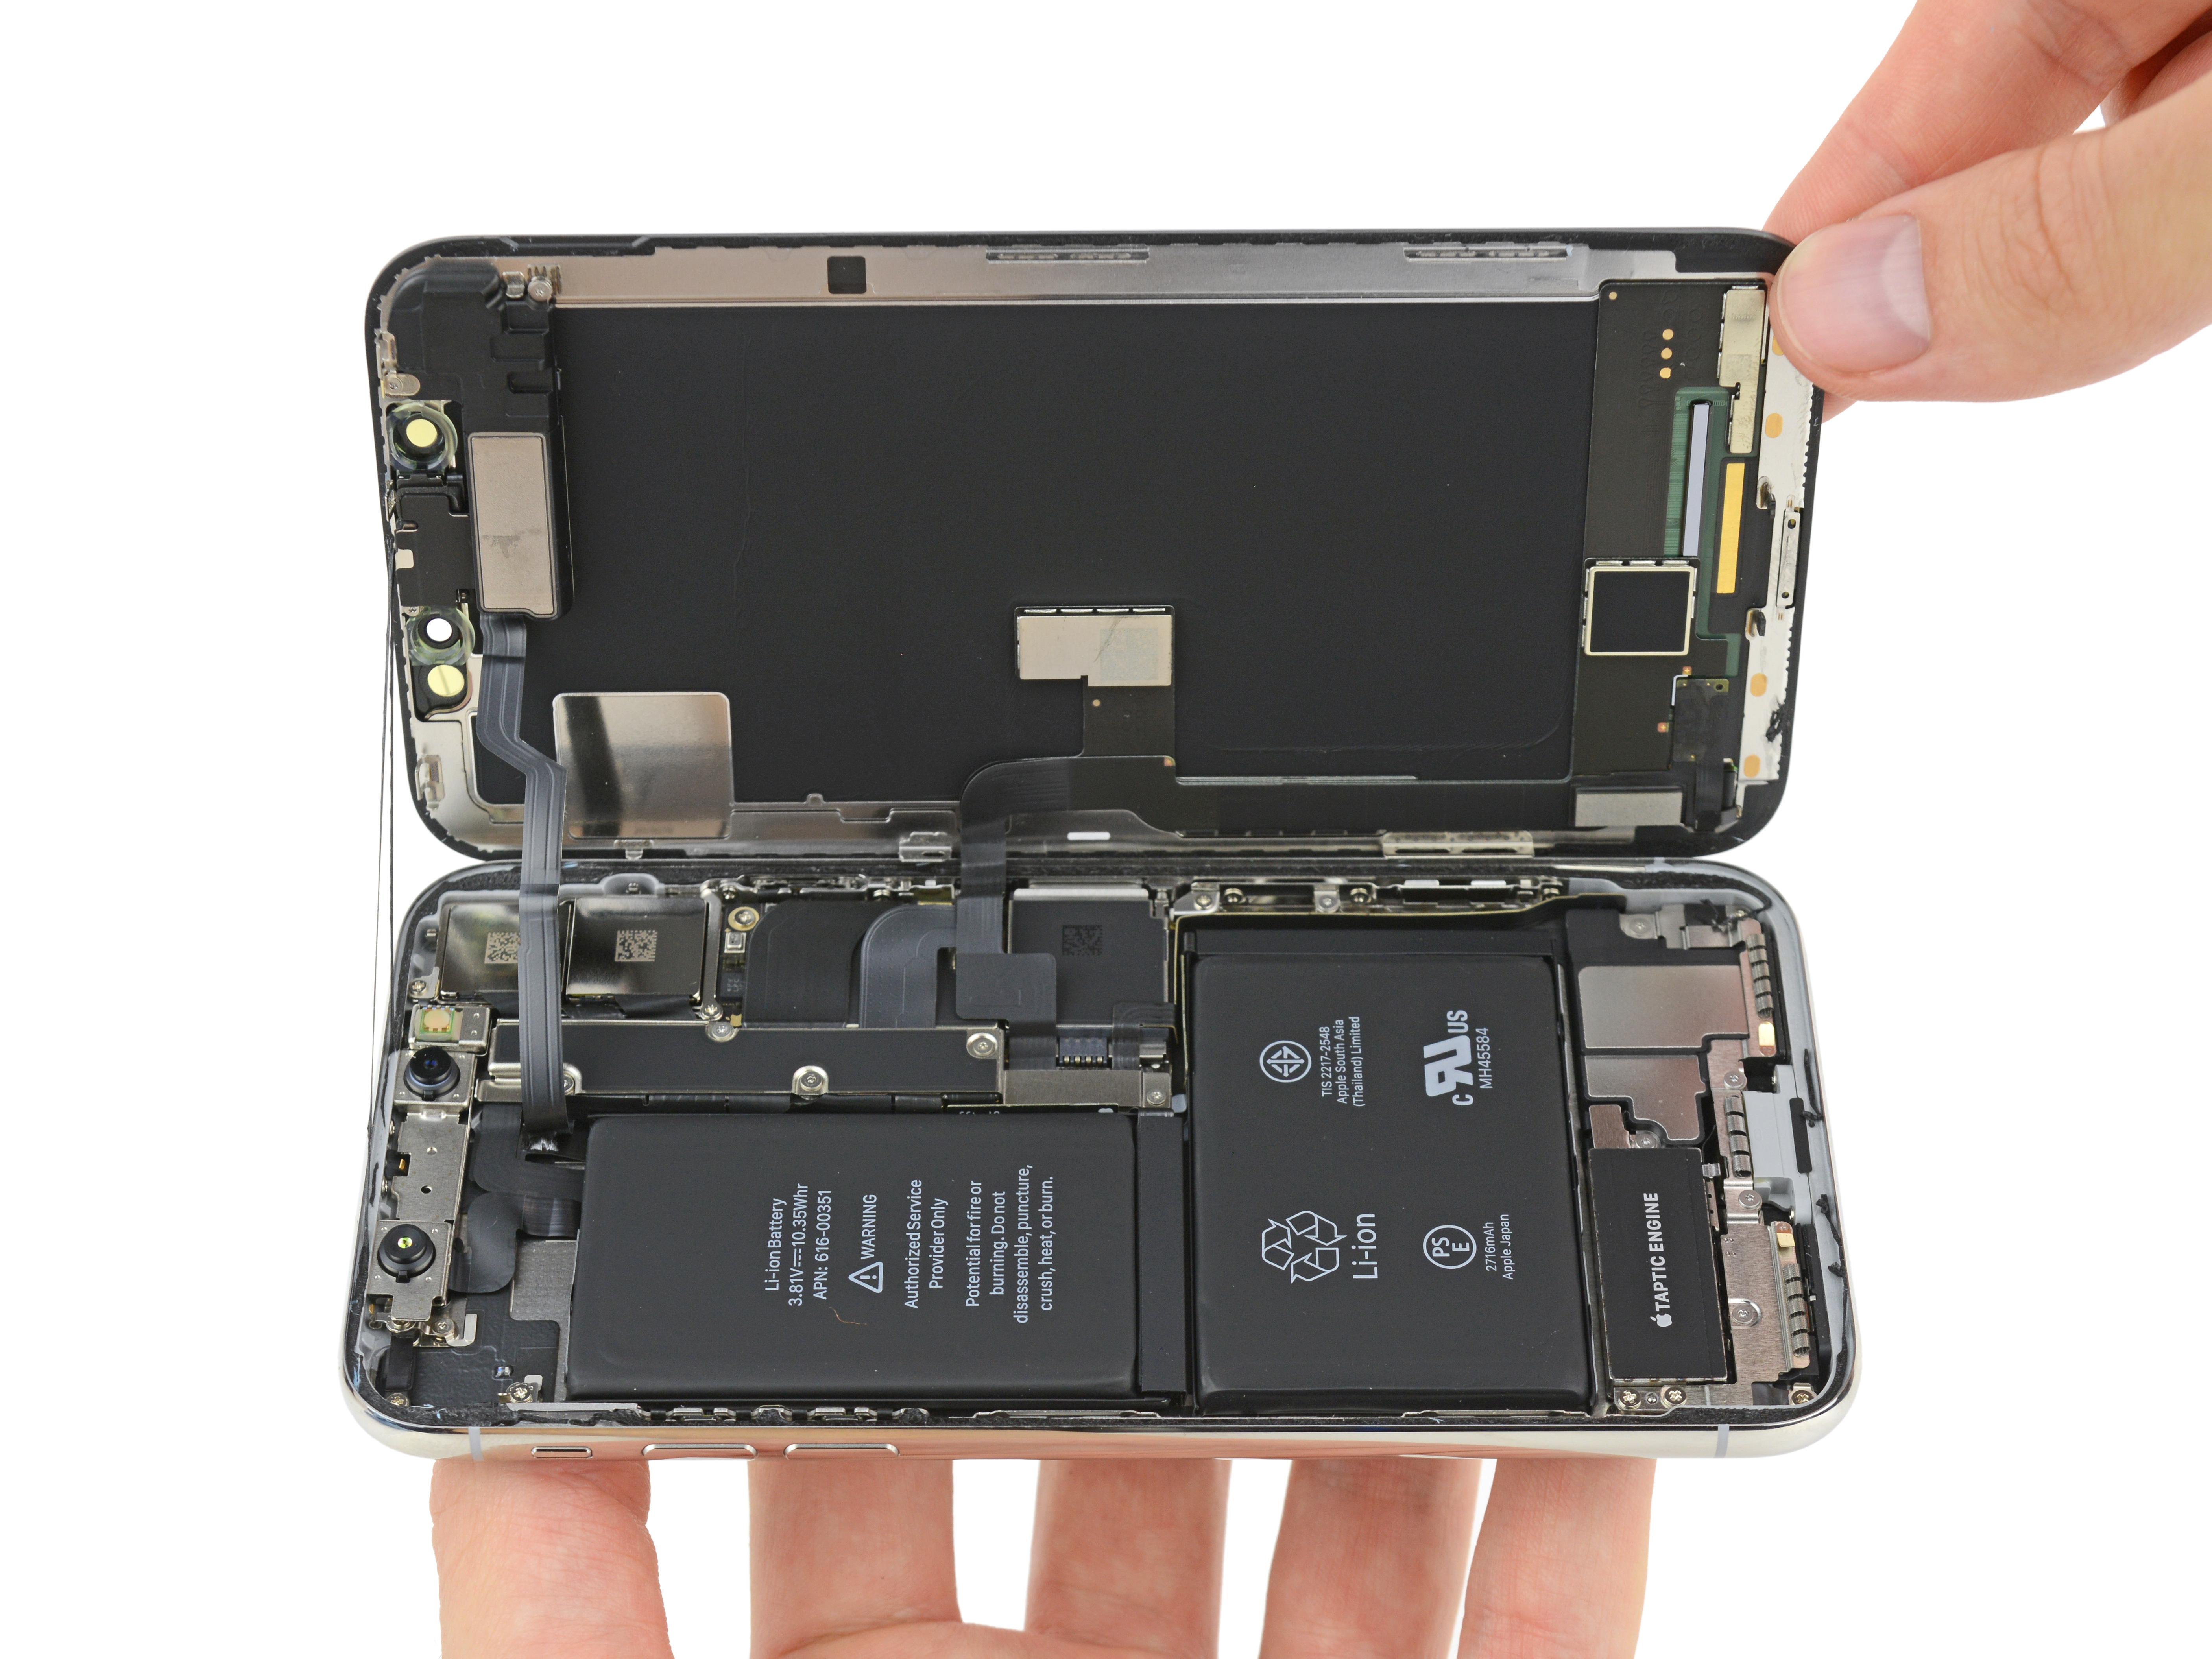 iPhone X por dentro visto de lado